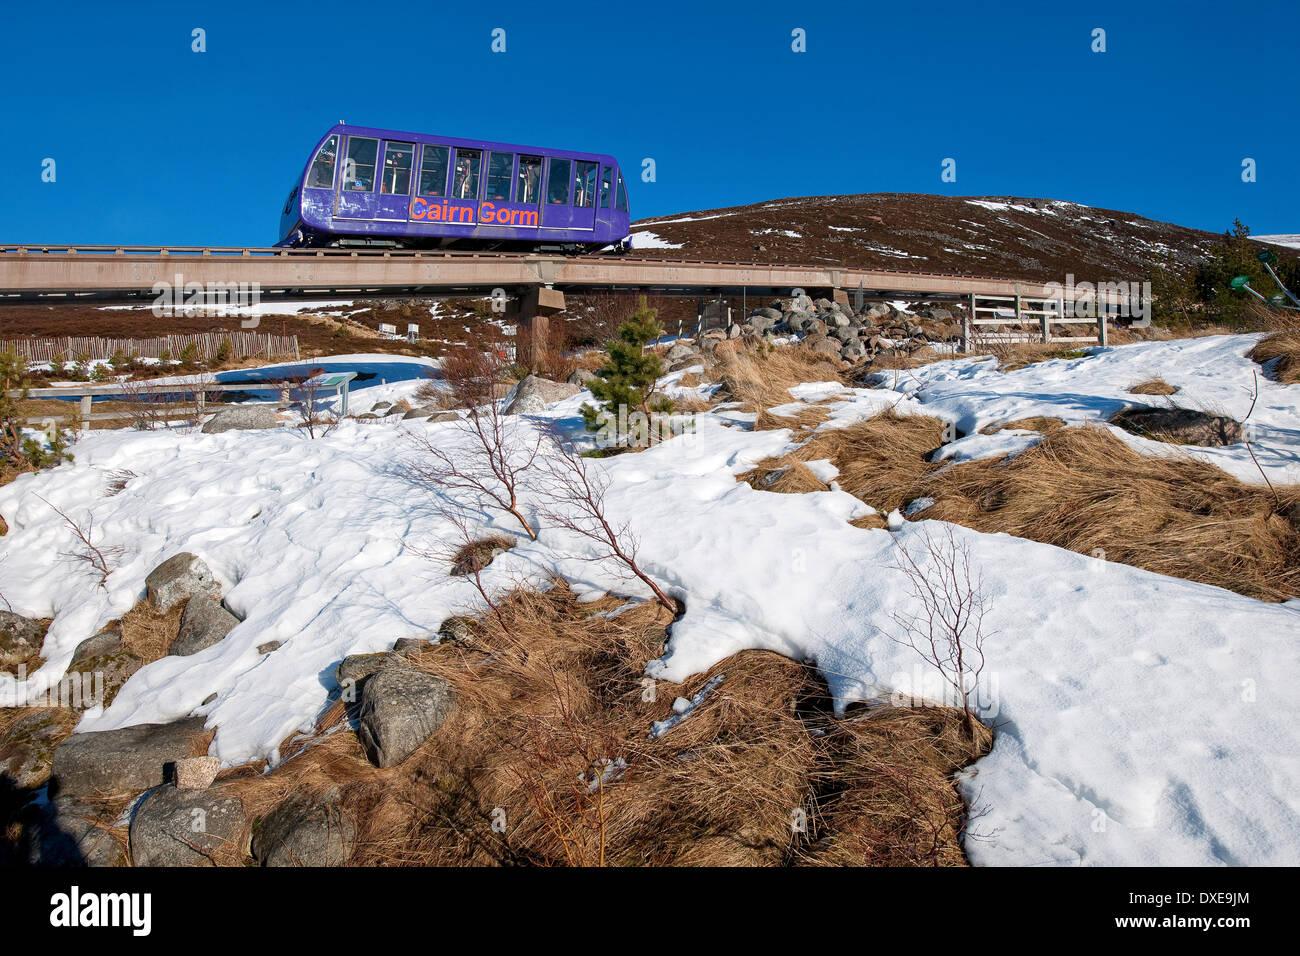 The cairngorm railway on lower slopes near terminus.Cairngorm-mountains,Glenmore. Stock Photo